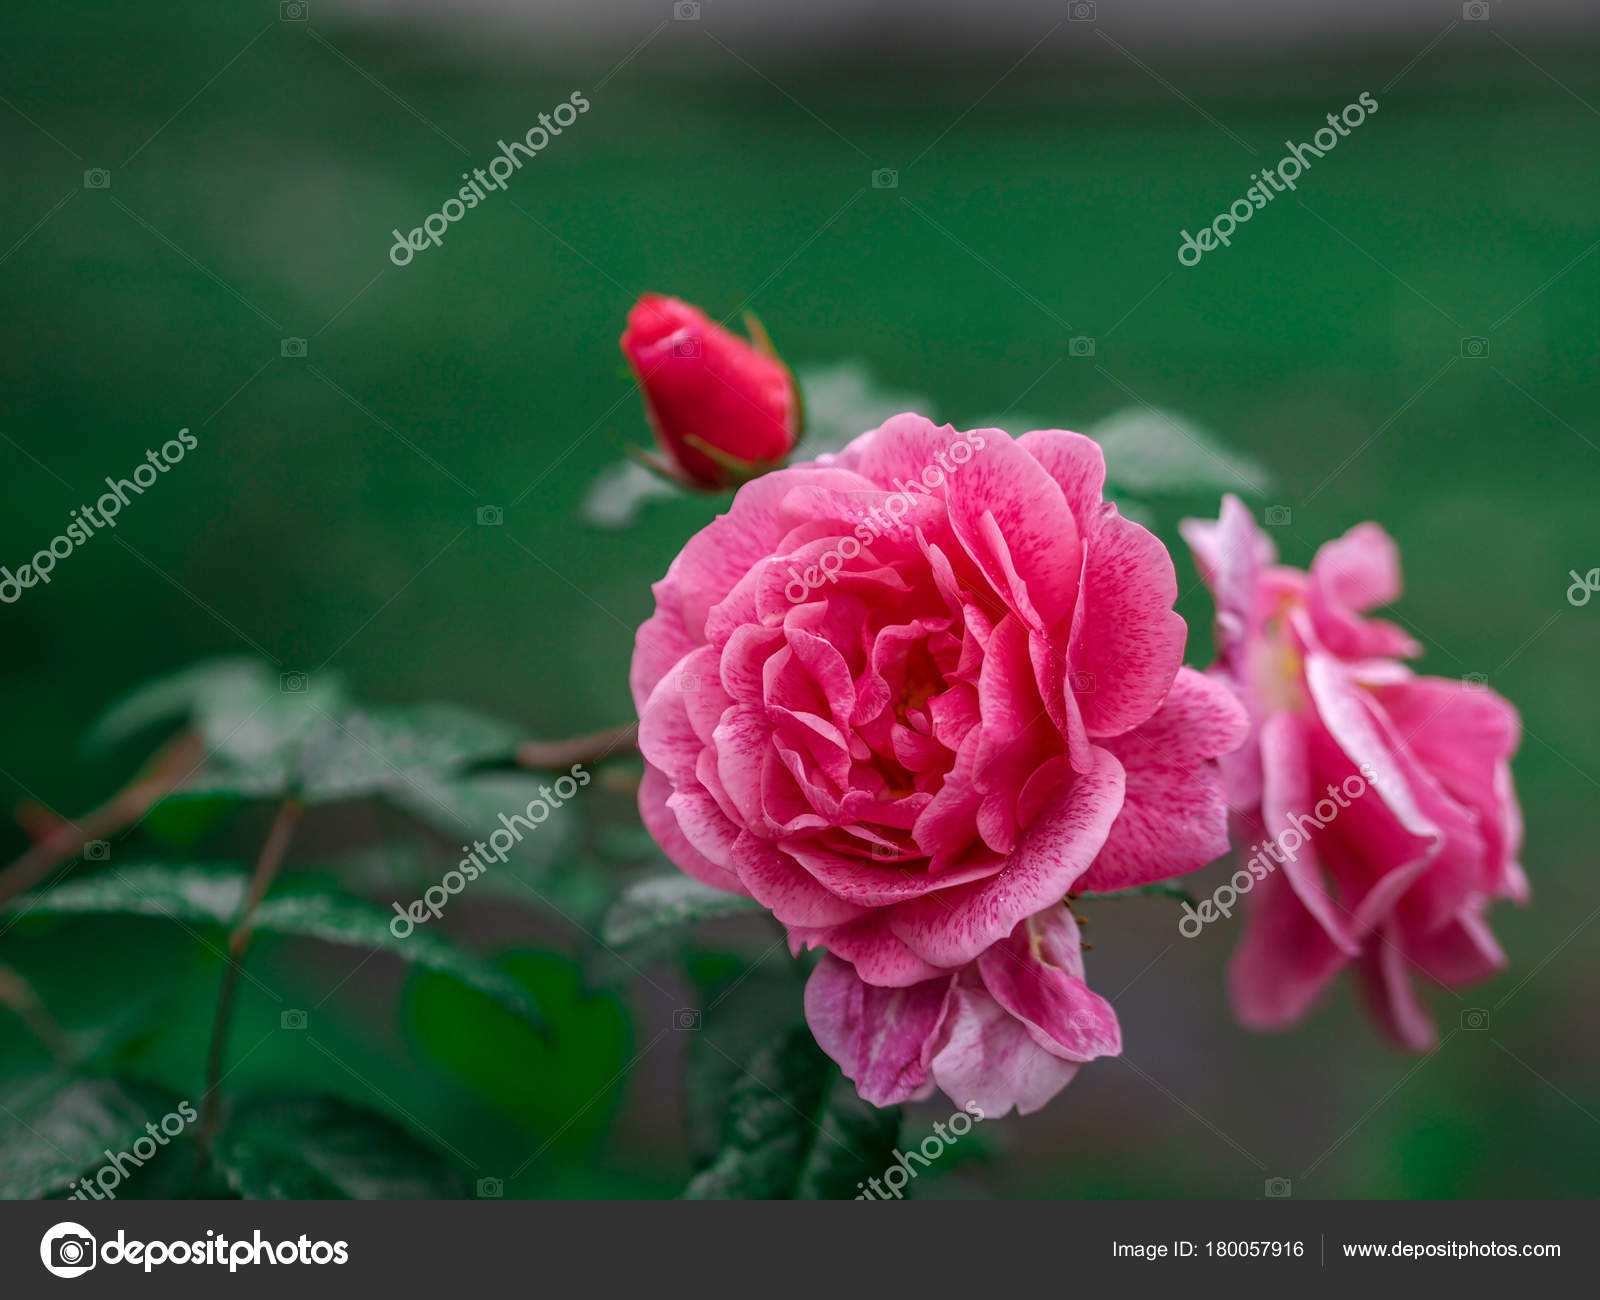 Fondos Rosas Para San Valentín Otra Celebración Enfoque Selectivo